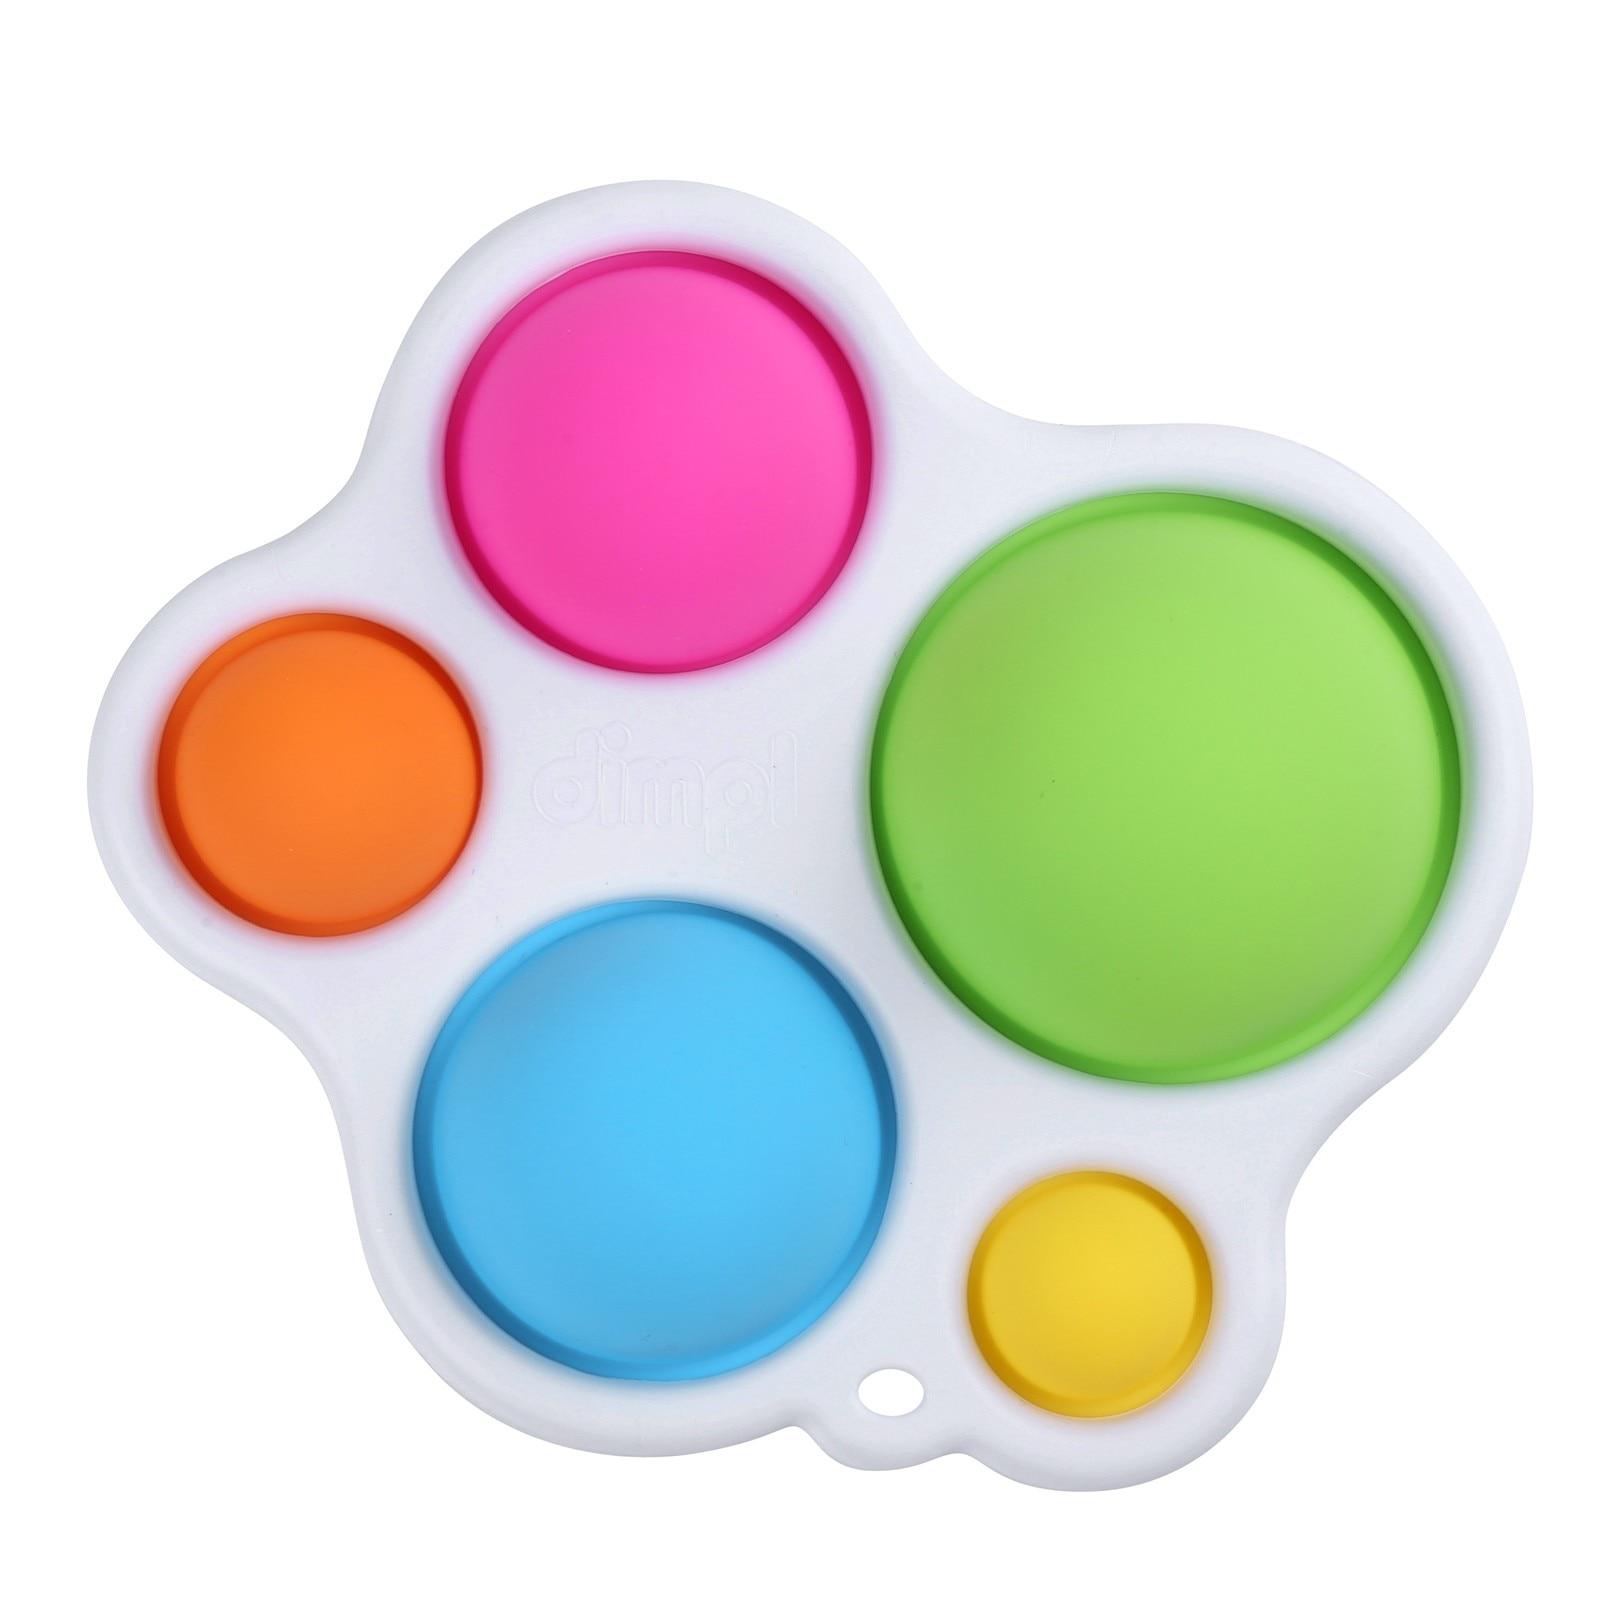 Toy Fidget-Toys Puzzle Baby-Toy Training Simple Dimple It-Sensory Pops Brain-Development-Enlightenment img2